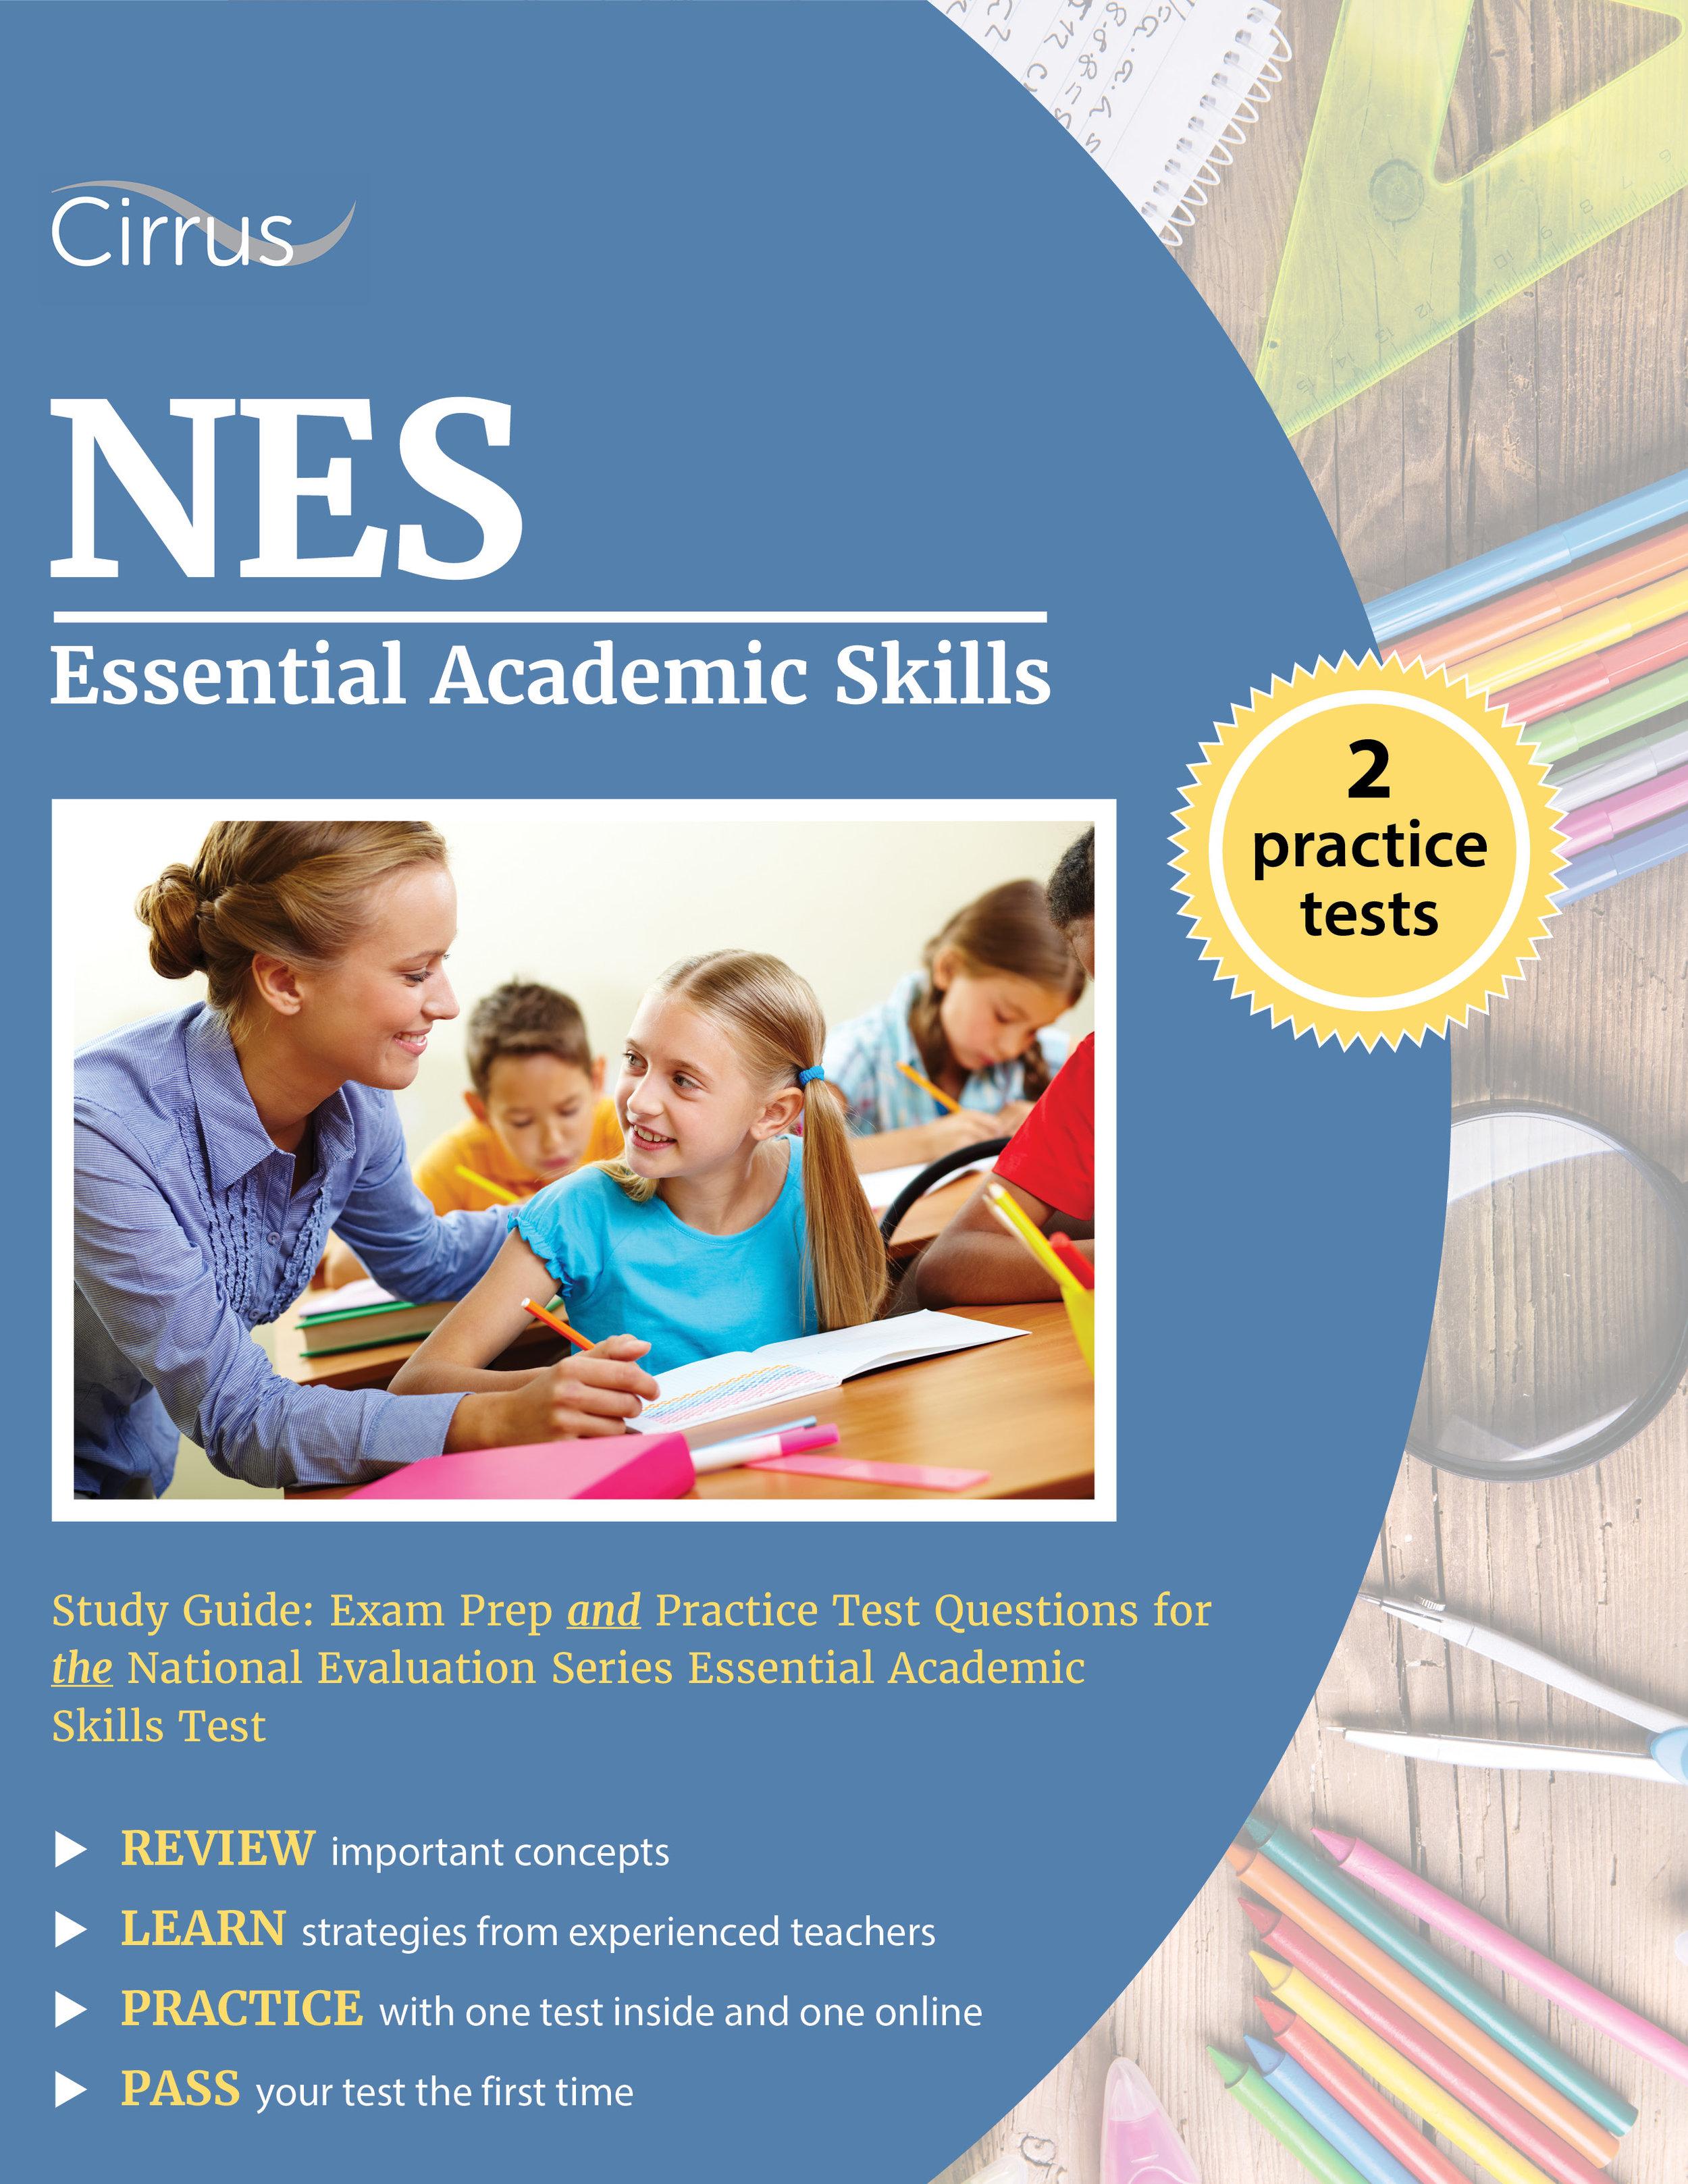 Minnesota NES Ess. Academic Skills Study Guide